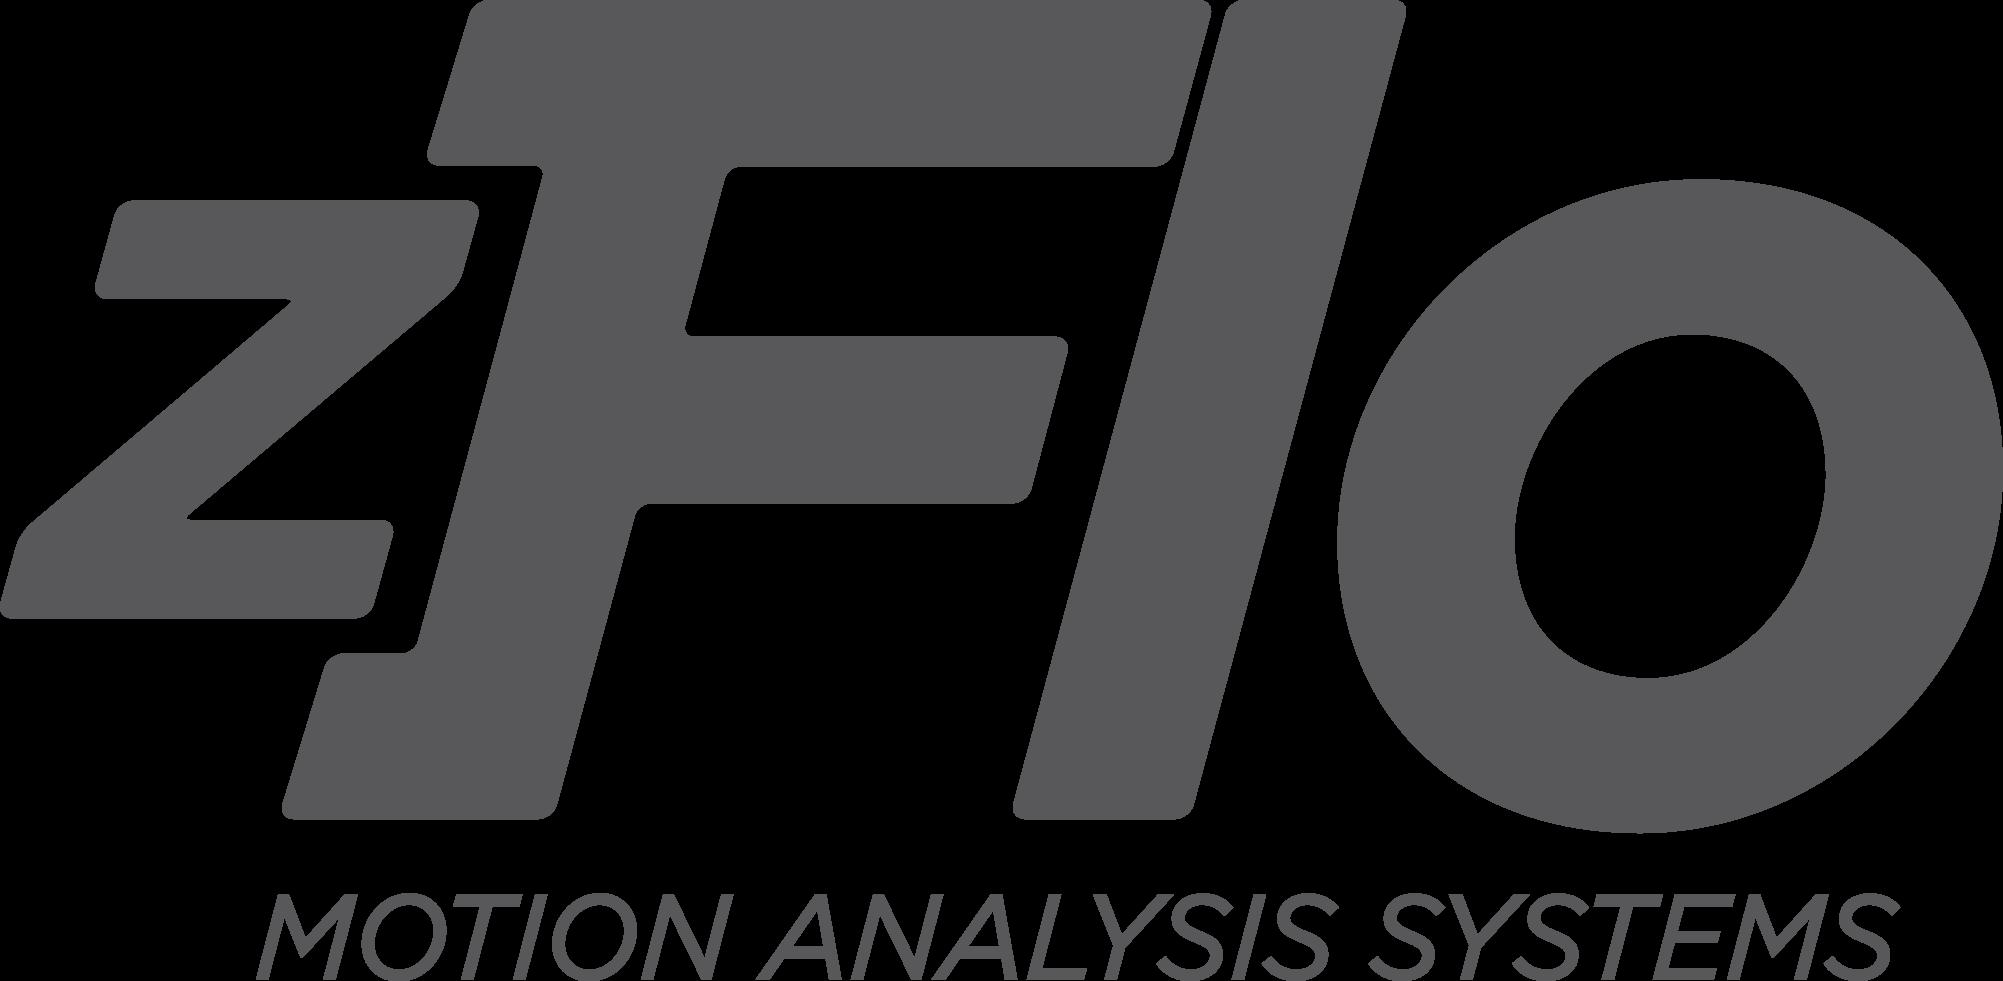 zflo_grey_logo